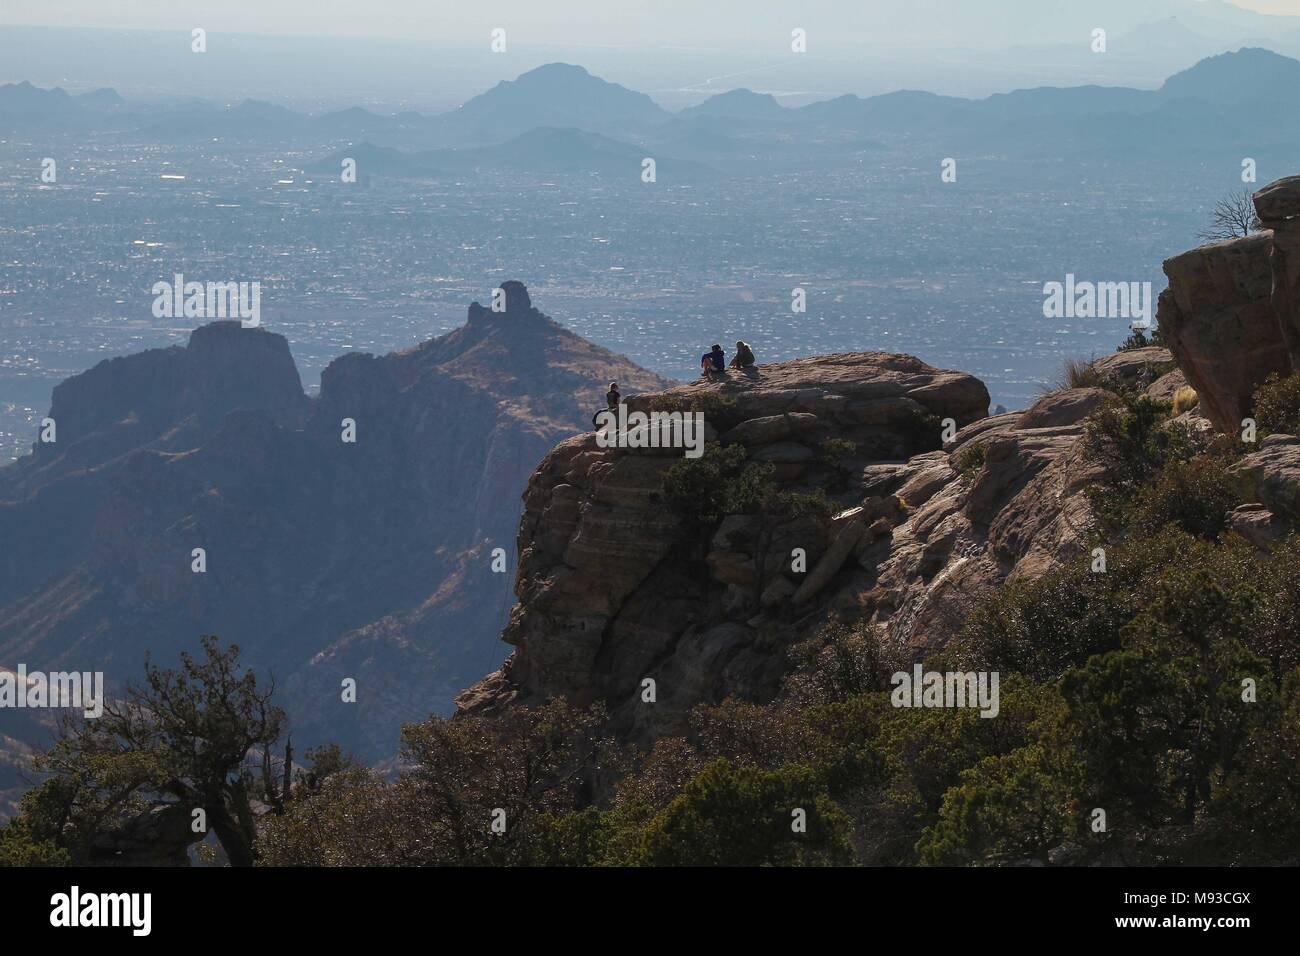 Mount Lemmon in Arizona Desert.  Mount Lemmon en Arizona.   ©NortePhoto - Stock Image